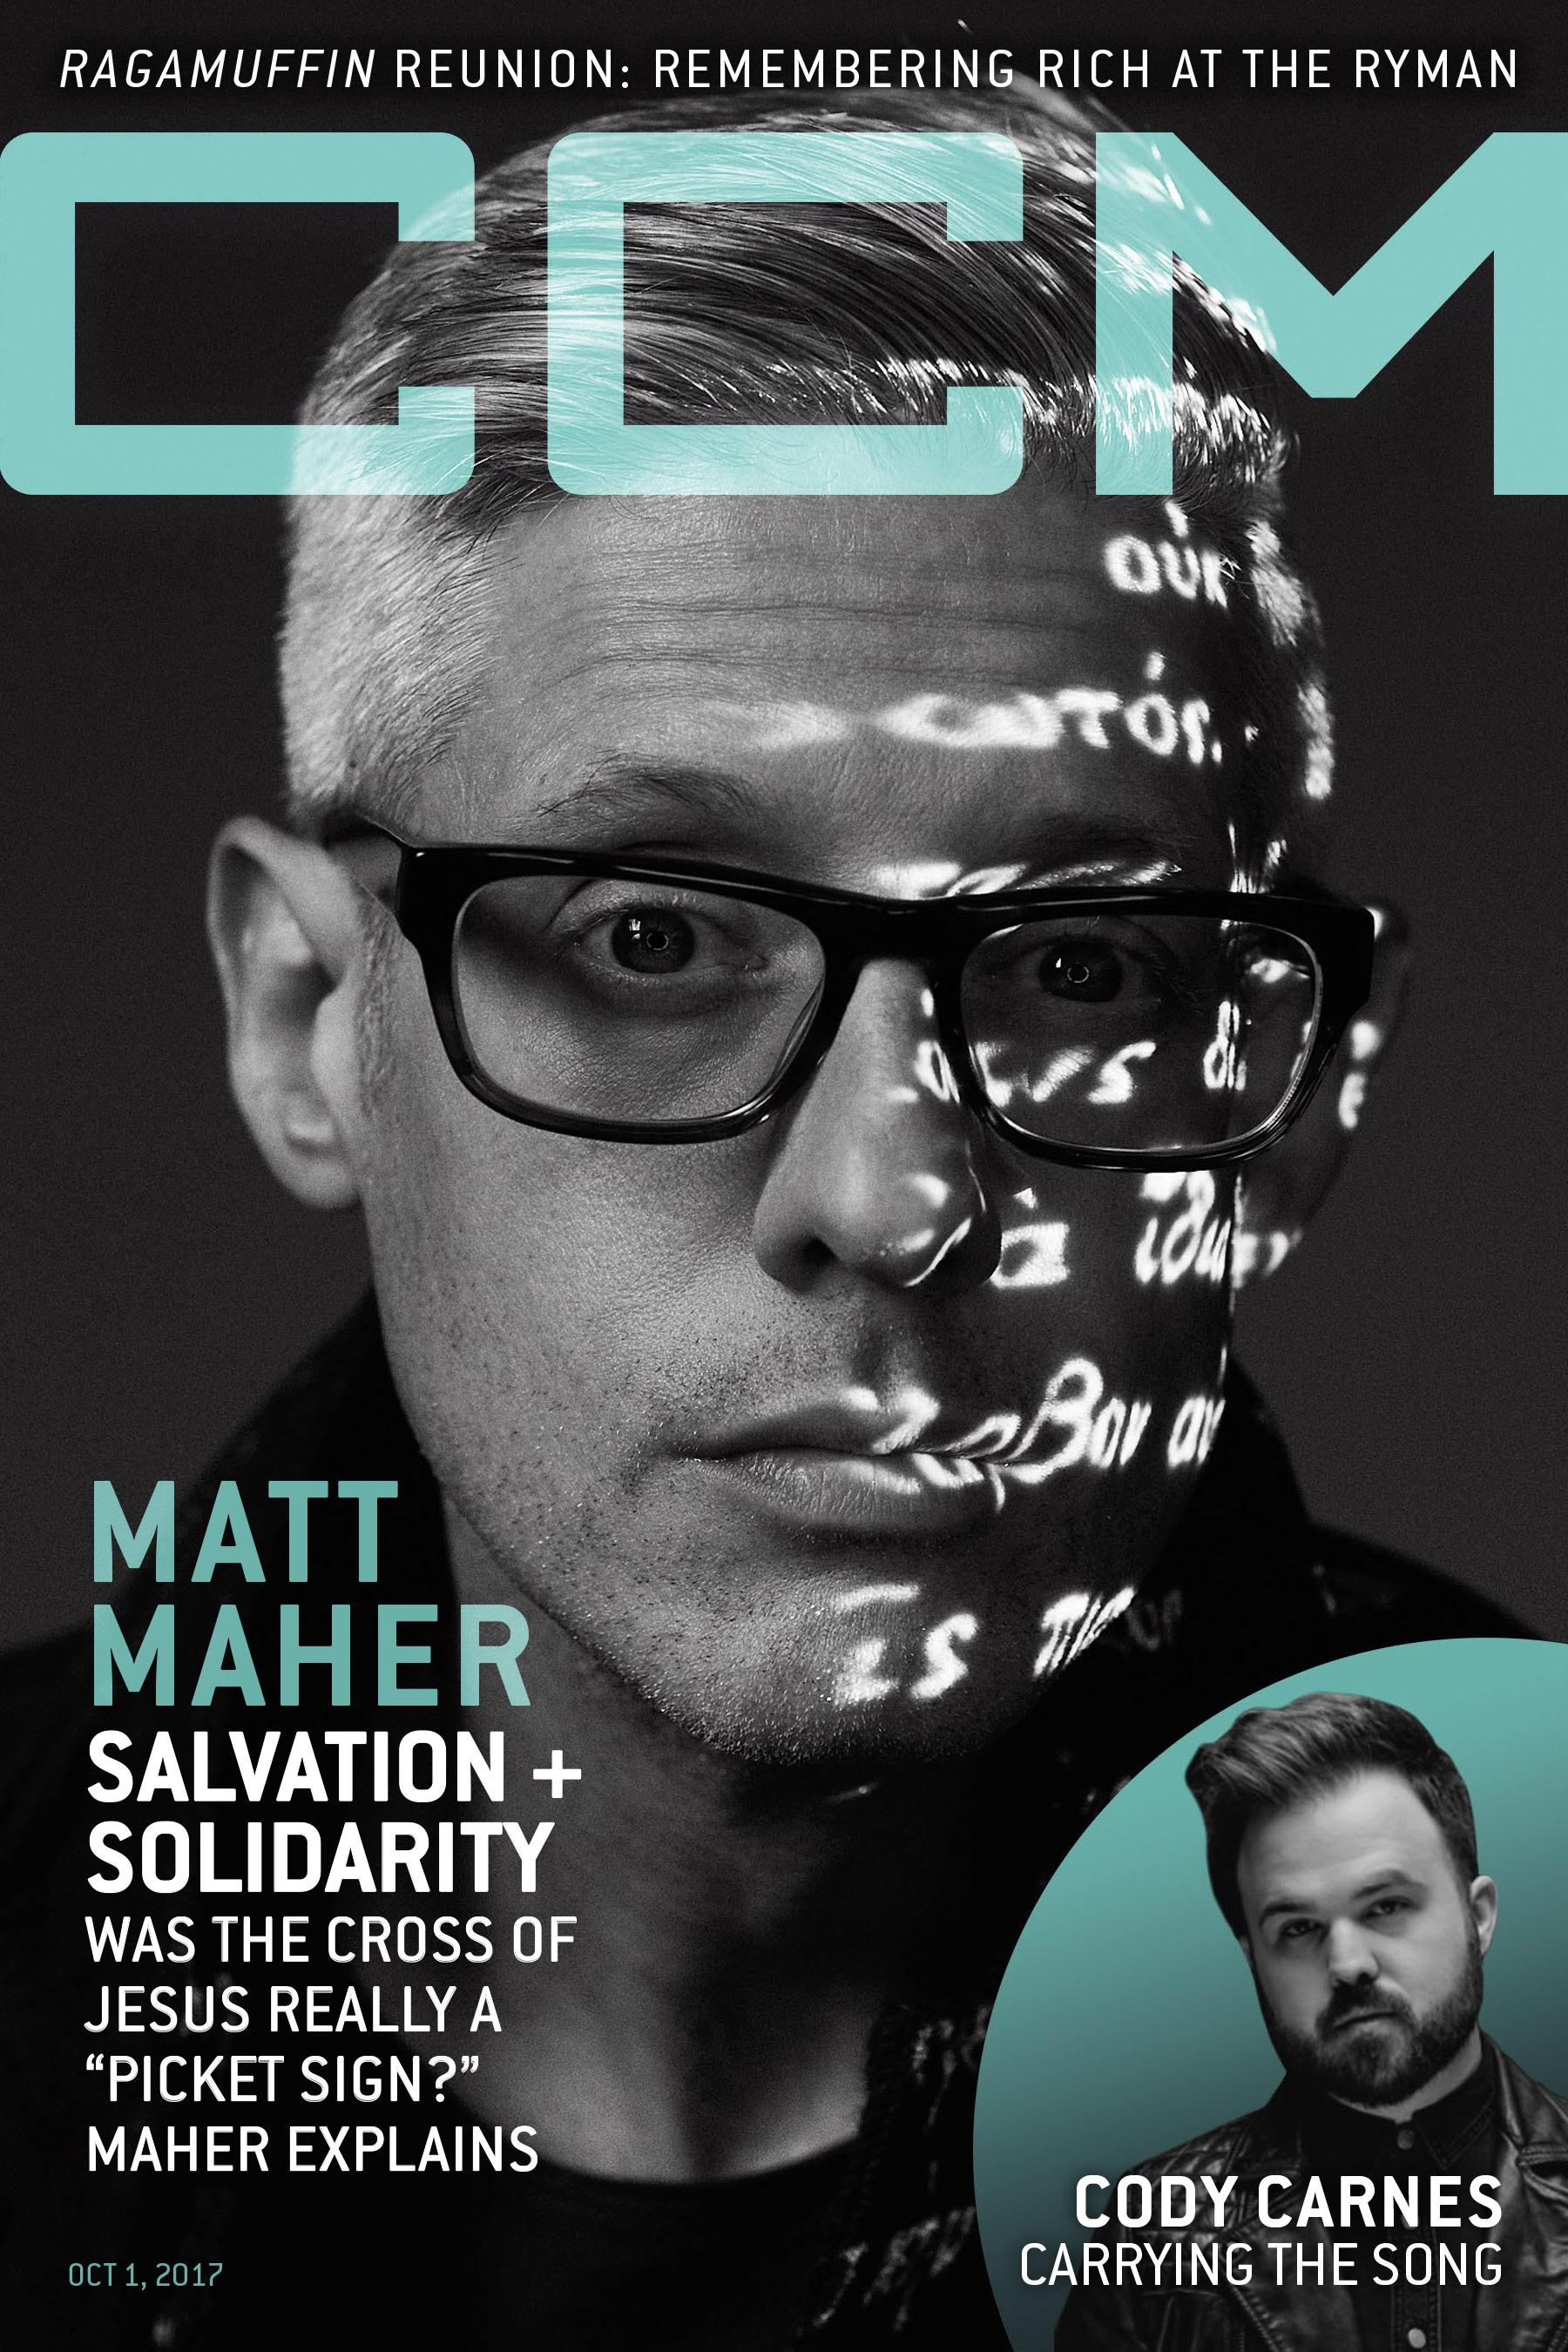 Matt Maher, CCM Magazine - image